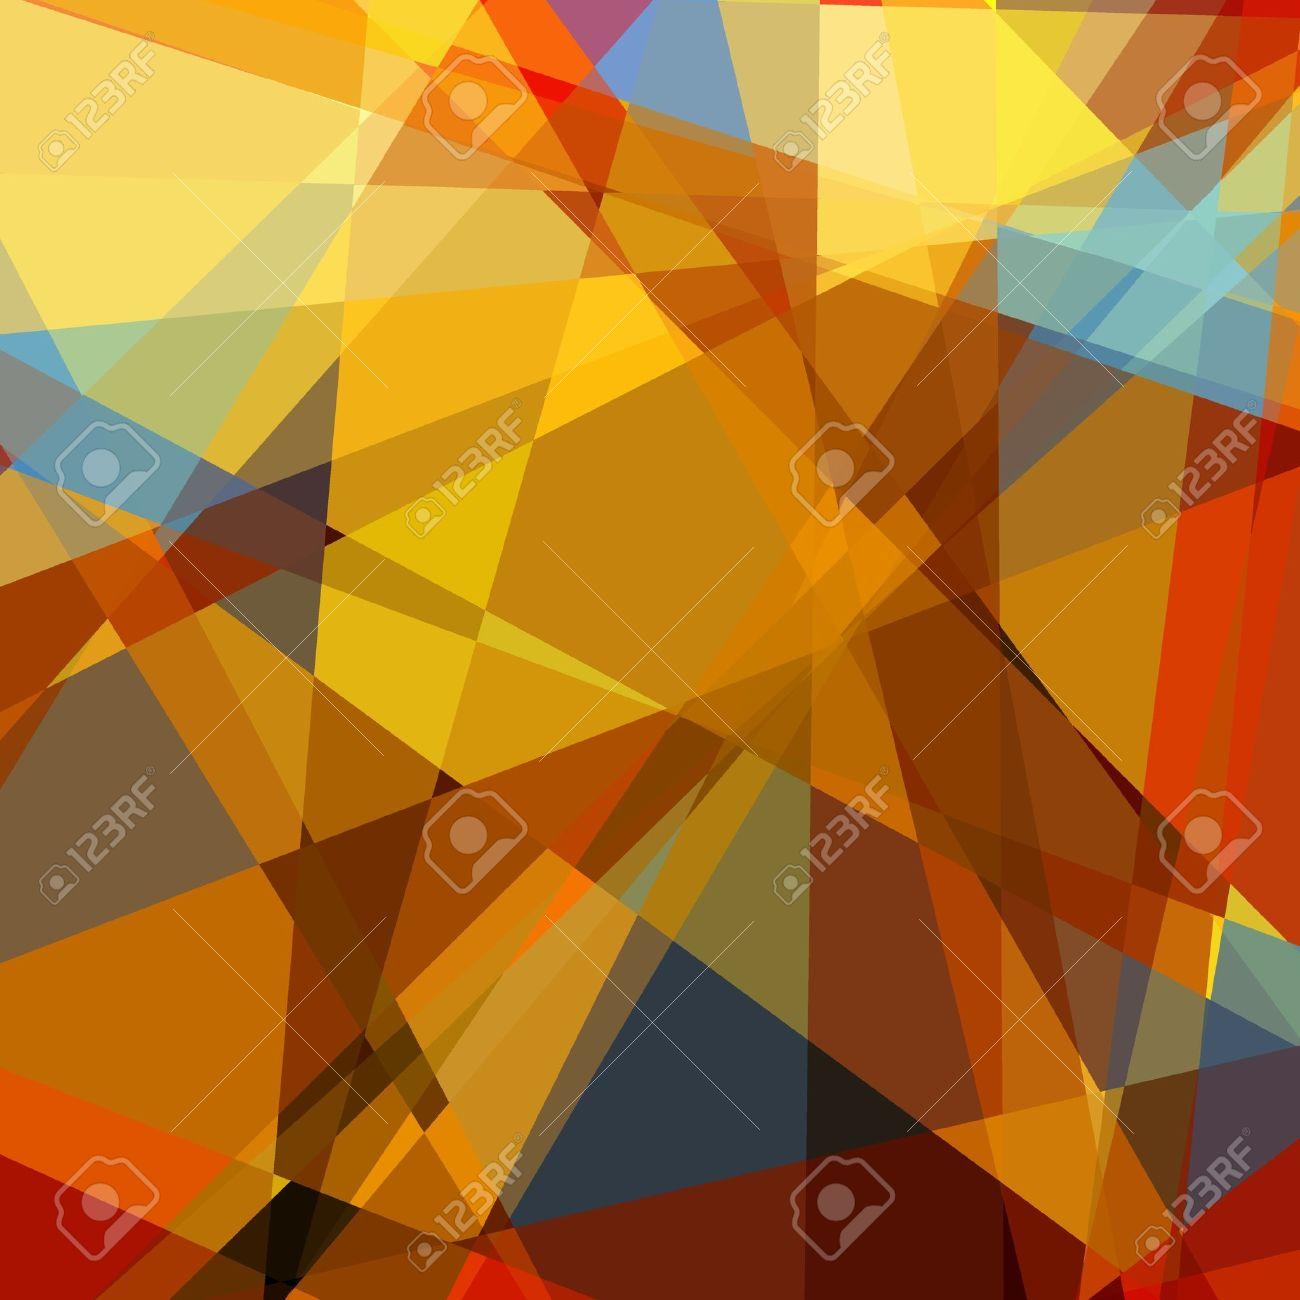 Retro colorful cubism art background Stock Photo - 15872735